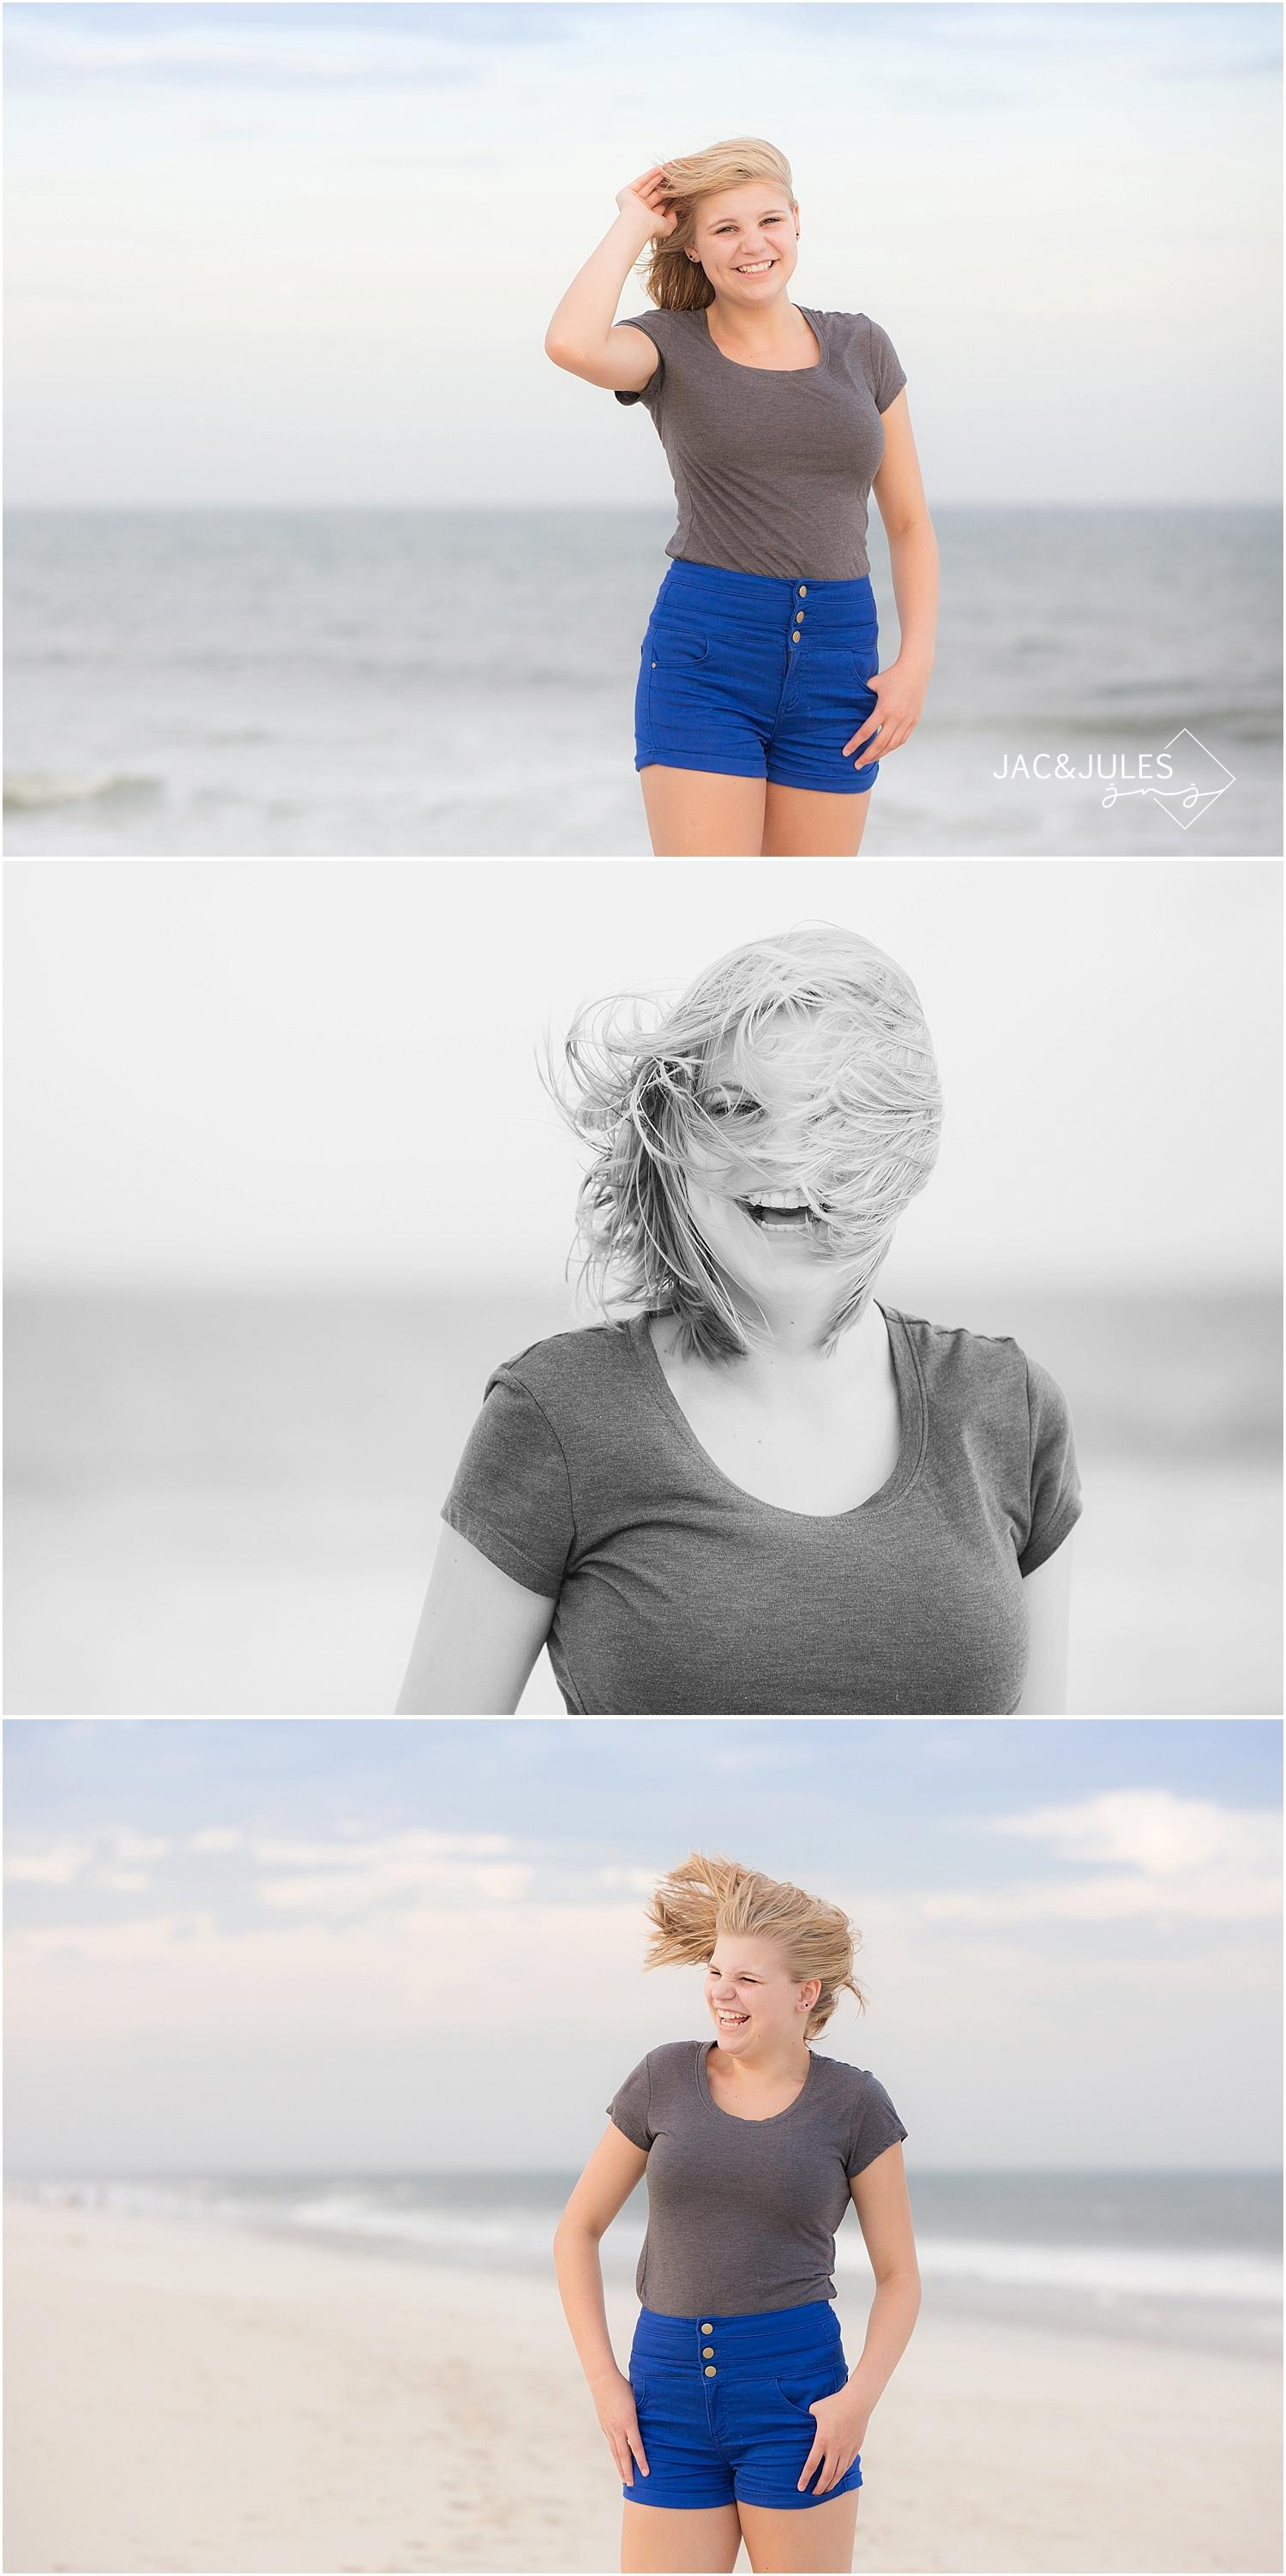 jacnjules takes fun family beach portraits in seaside park, nj